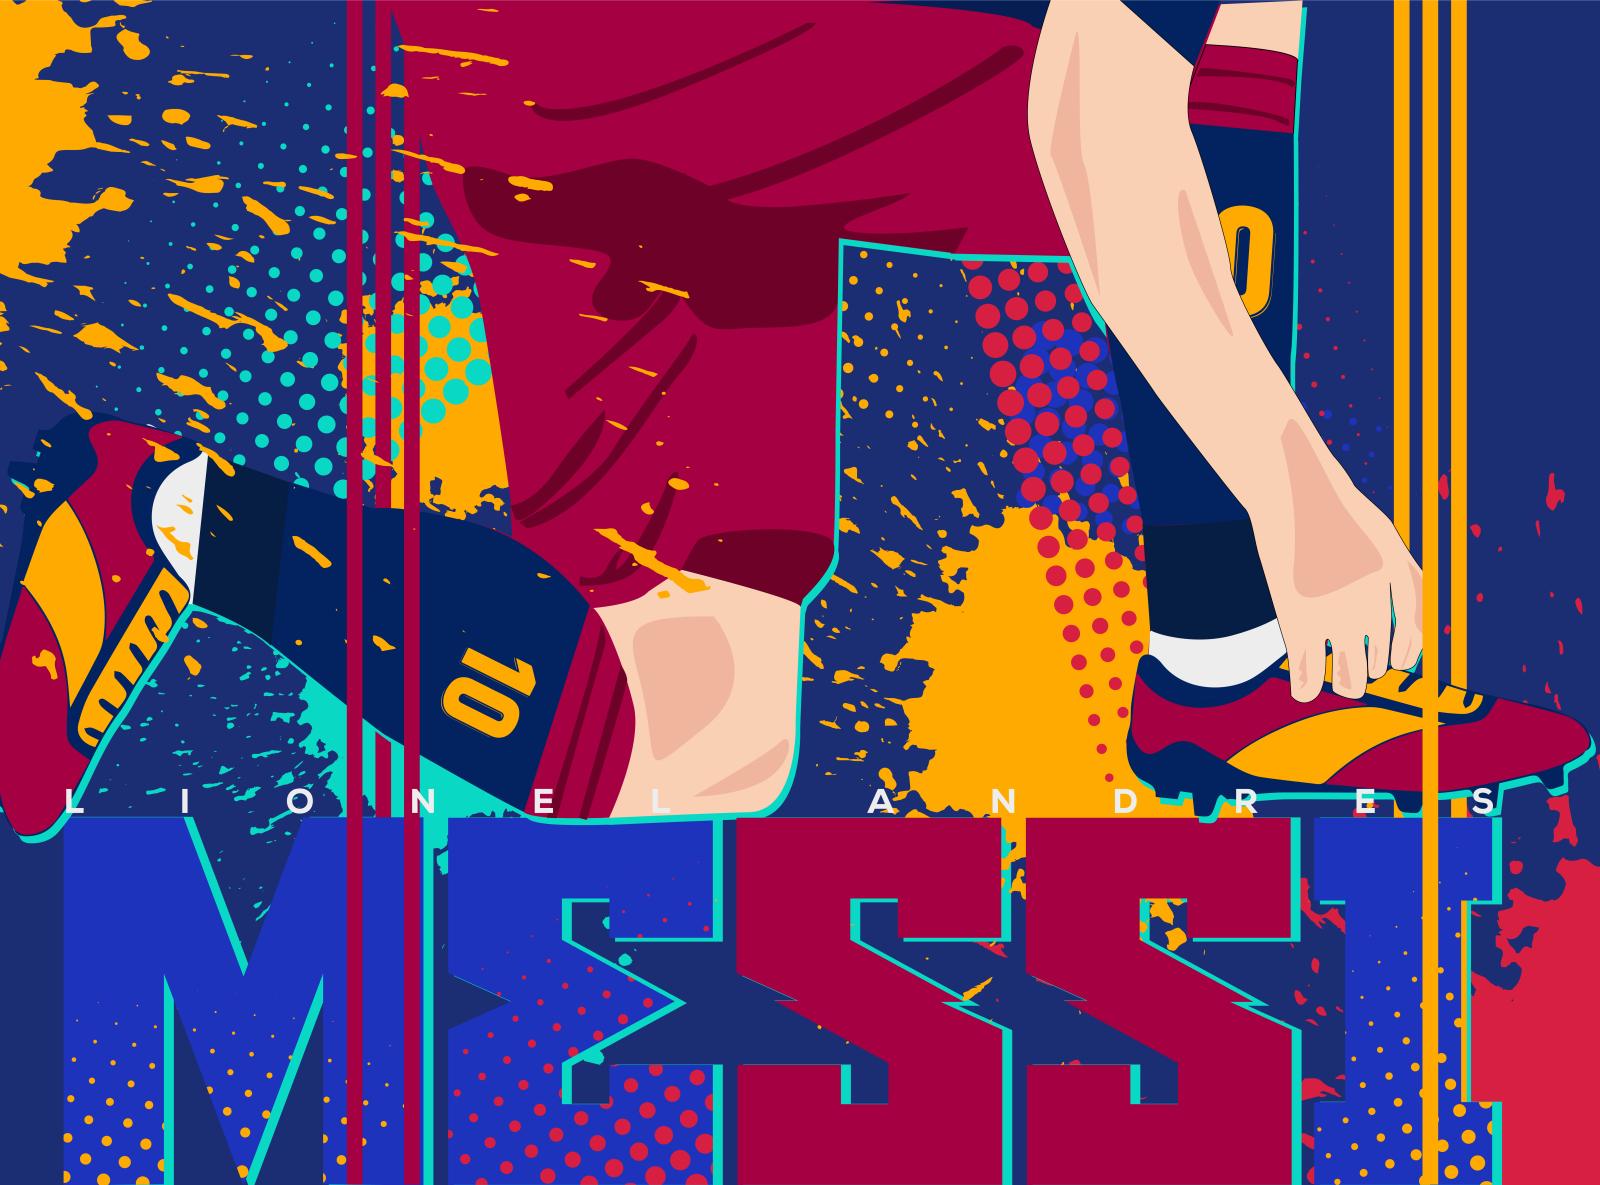 Lionel Messi Wallpaper Illustration By Md Hi Shuvo On Dribbble